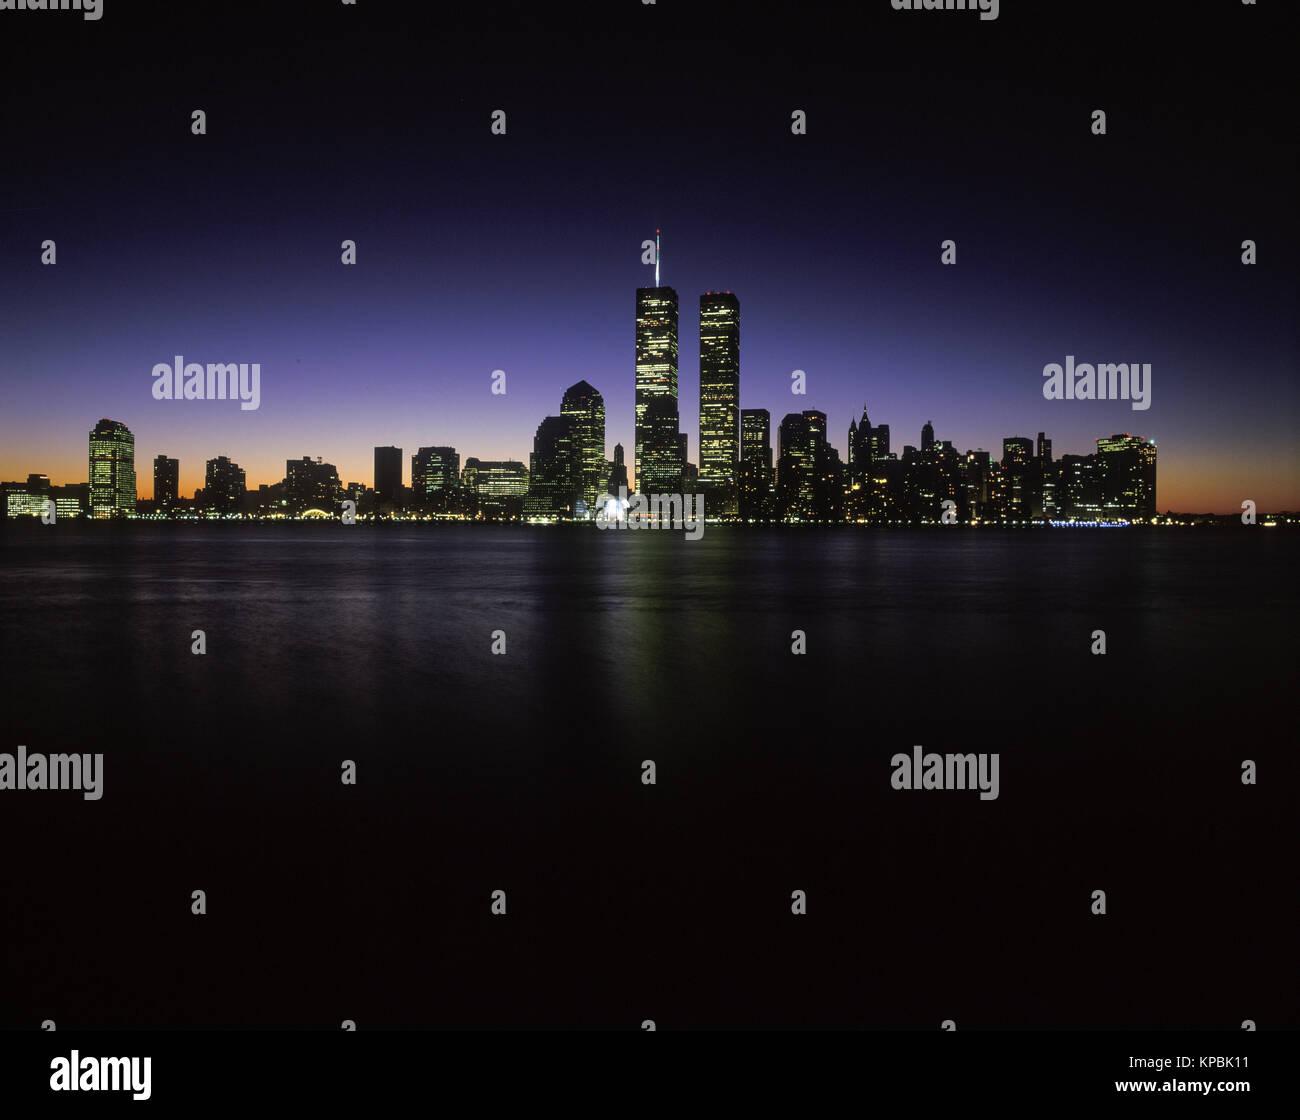 1995 HISTORICAL TWIN TOWERS (©MINORU YAMASAKI 1973) DOWNTOWN SKYLINE HUDSON RIVER MANHATTAN NEW YORK CITY USA - Stock Image